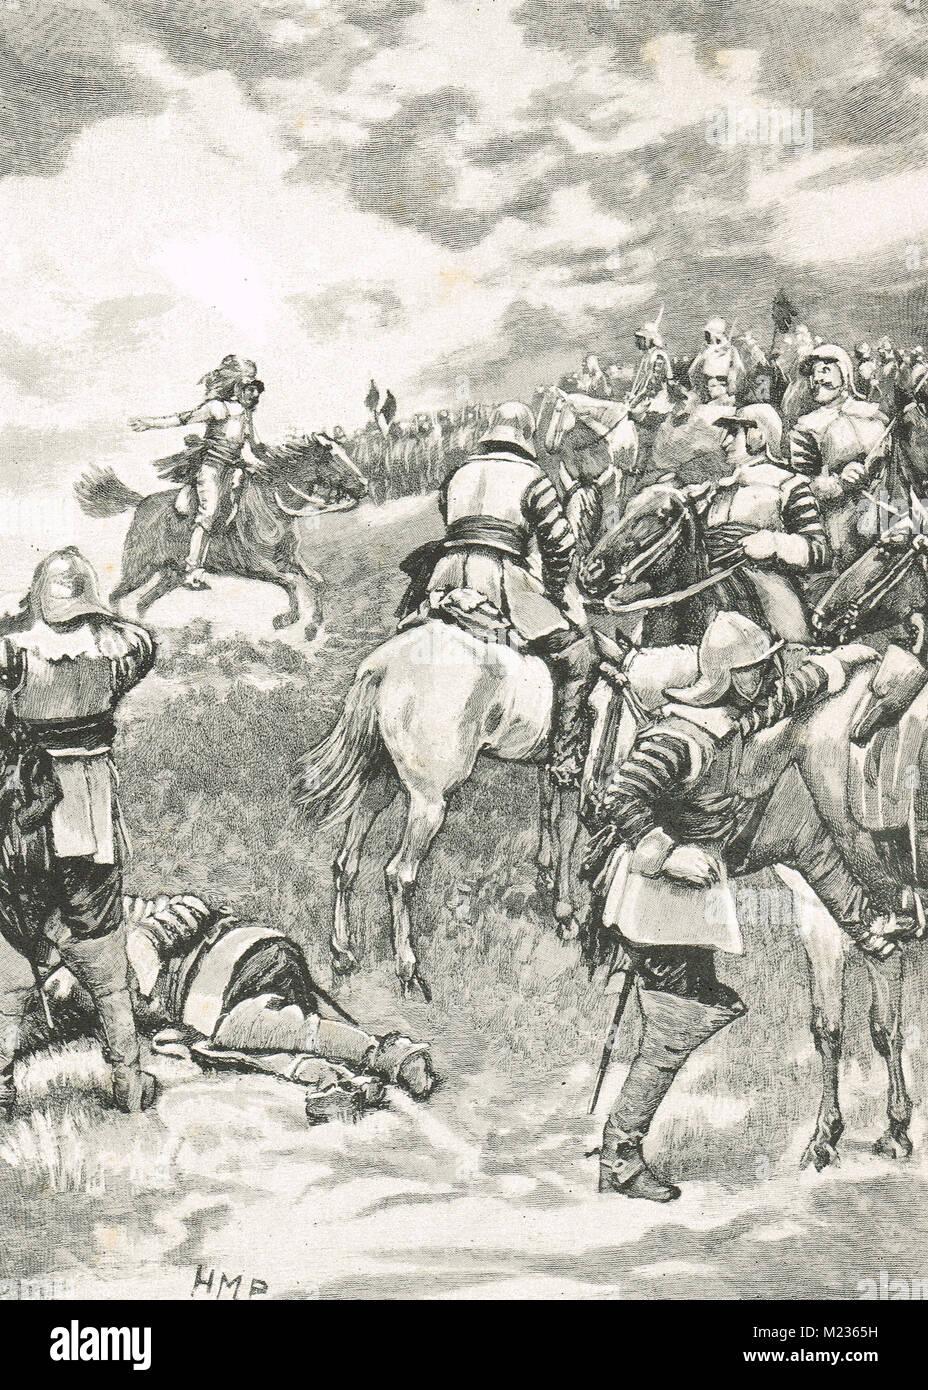 Charles I, están tratando de reunir a su ejército, Batalla de Naseby, 14 de junio de 1645 Imagen De Stock